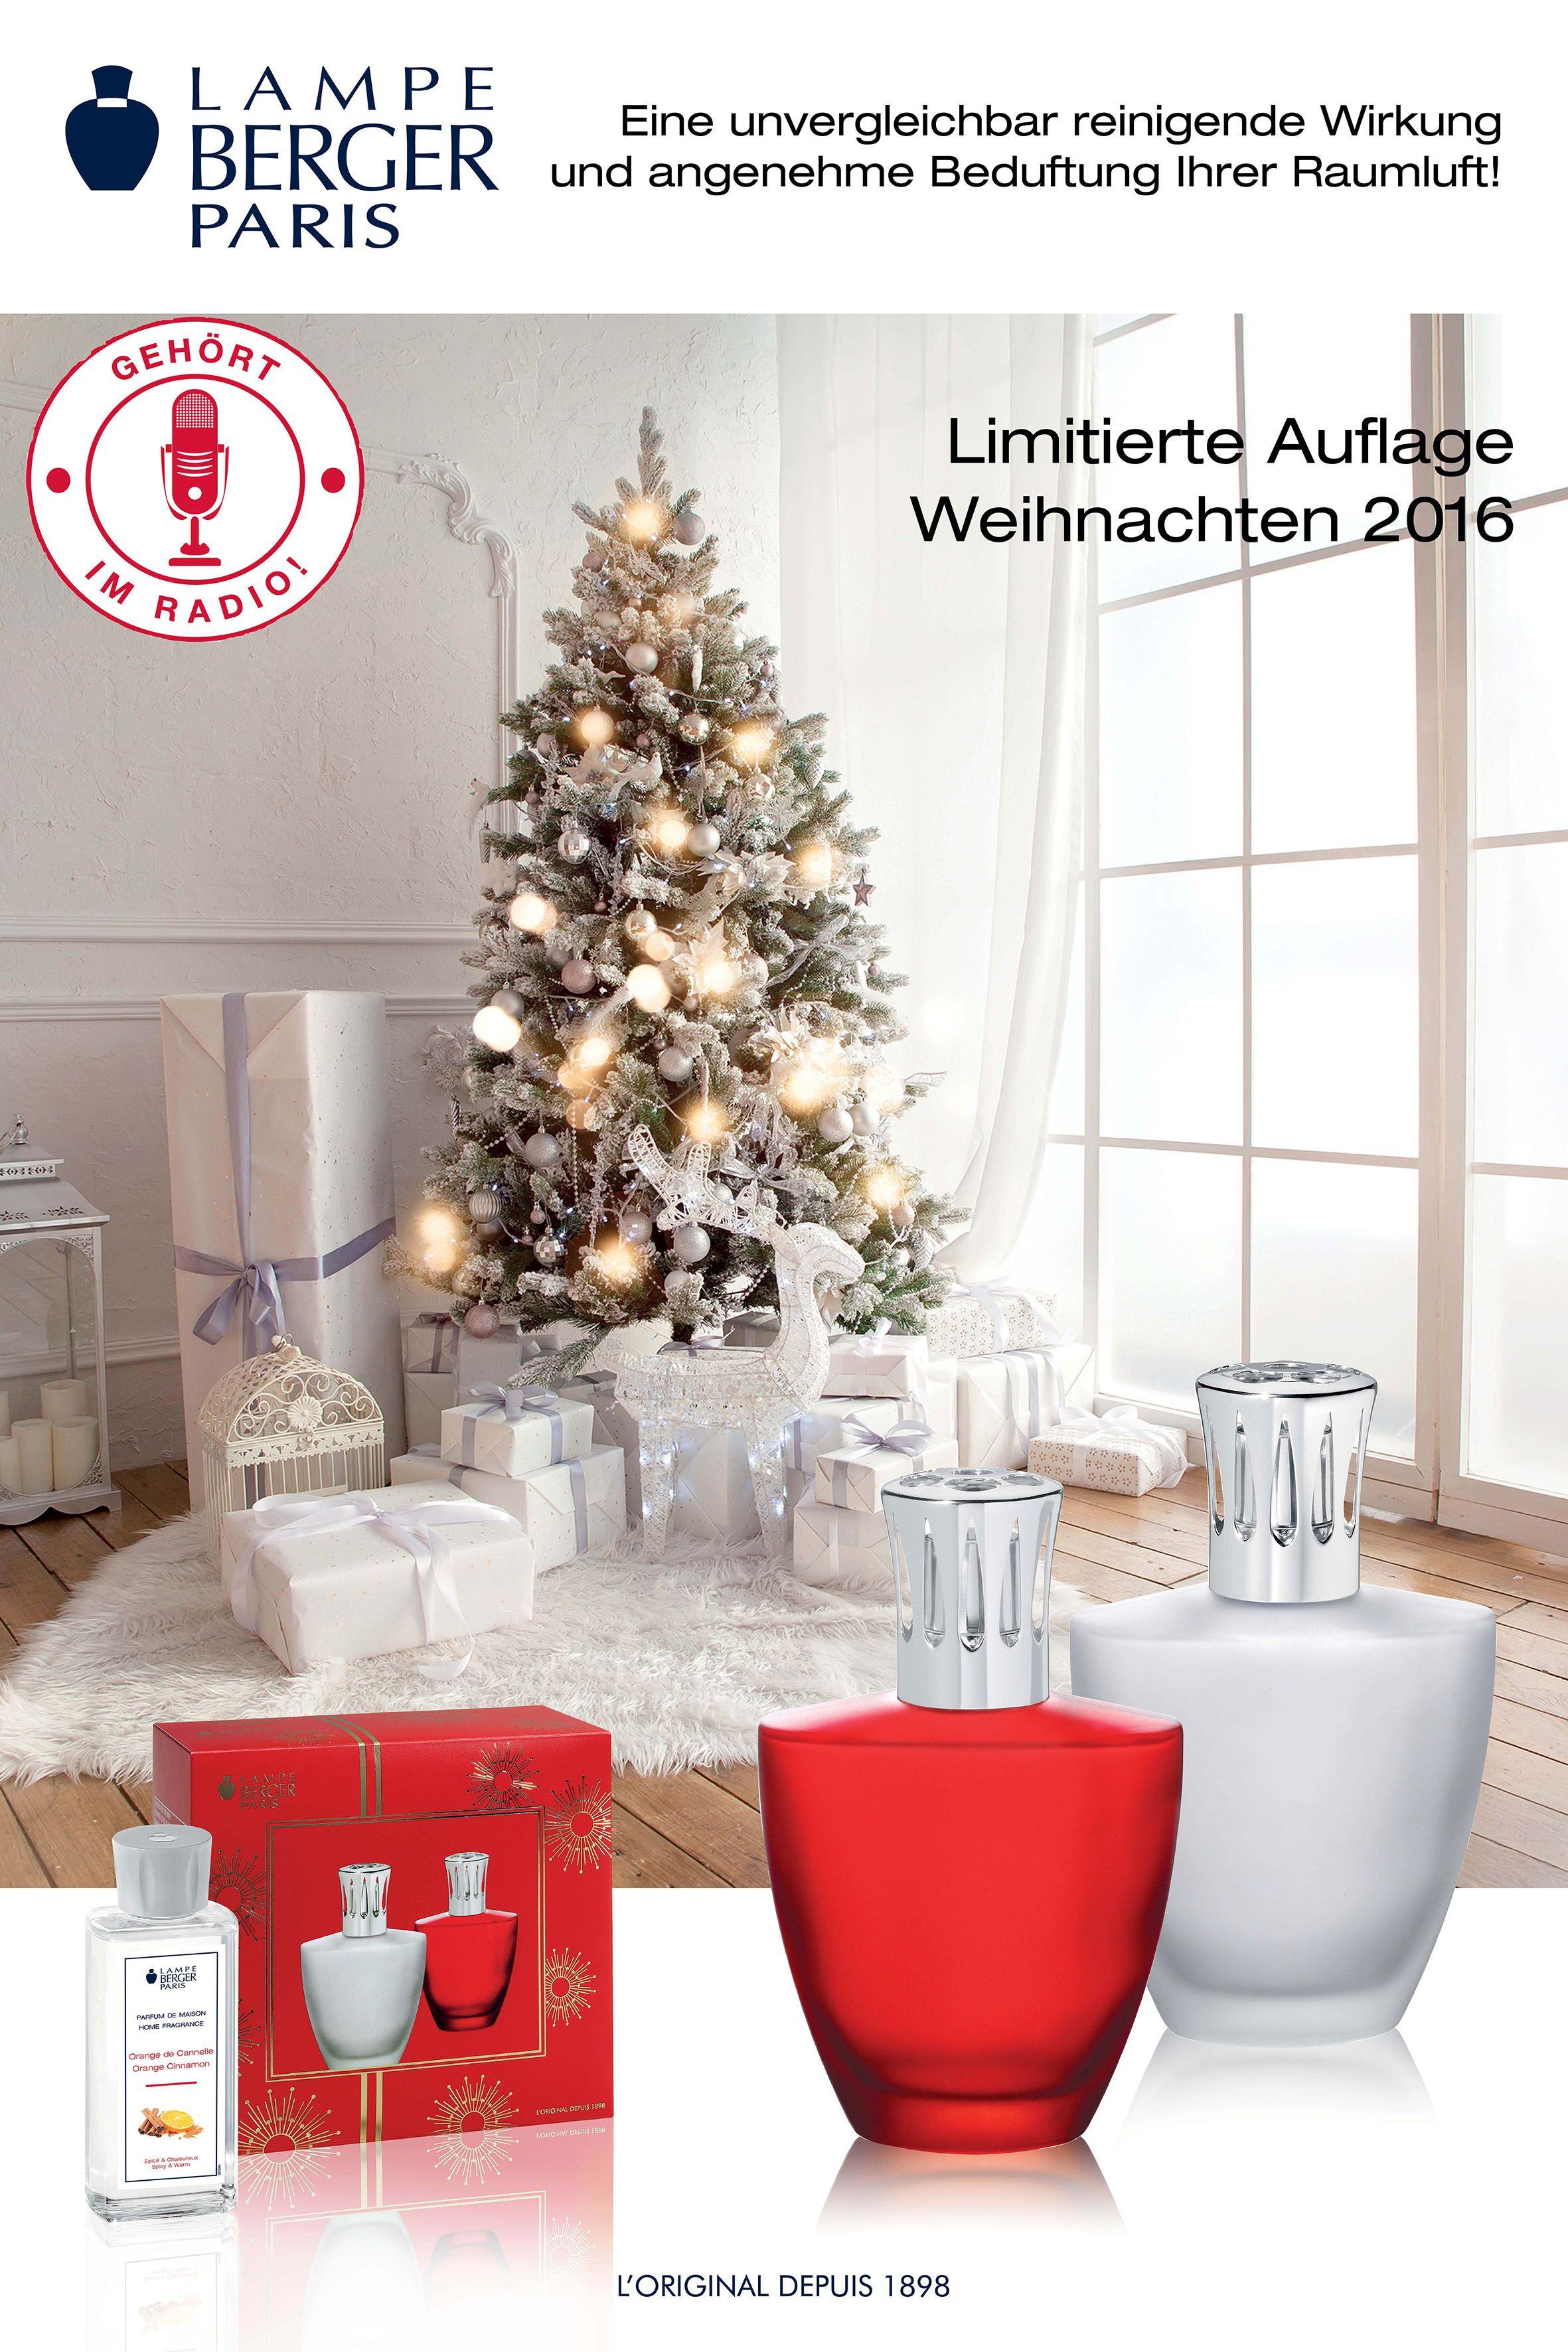 Weihnachts Berger Paris SetLooms Lampe Lampen uOkZiPXT